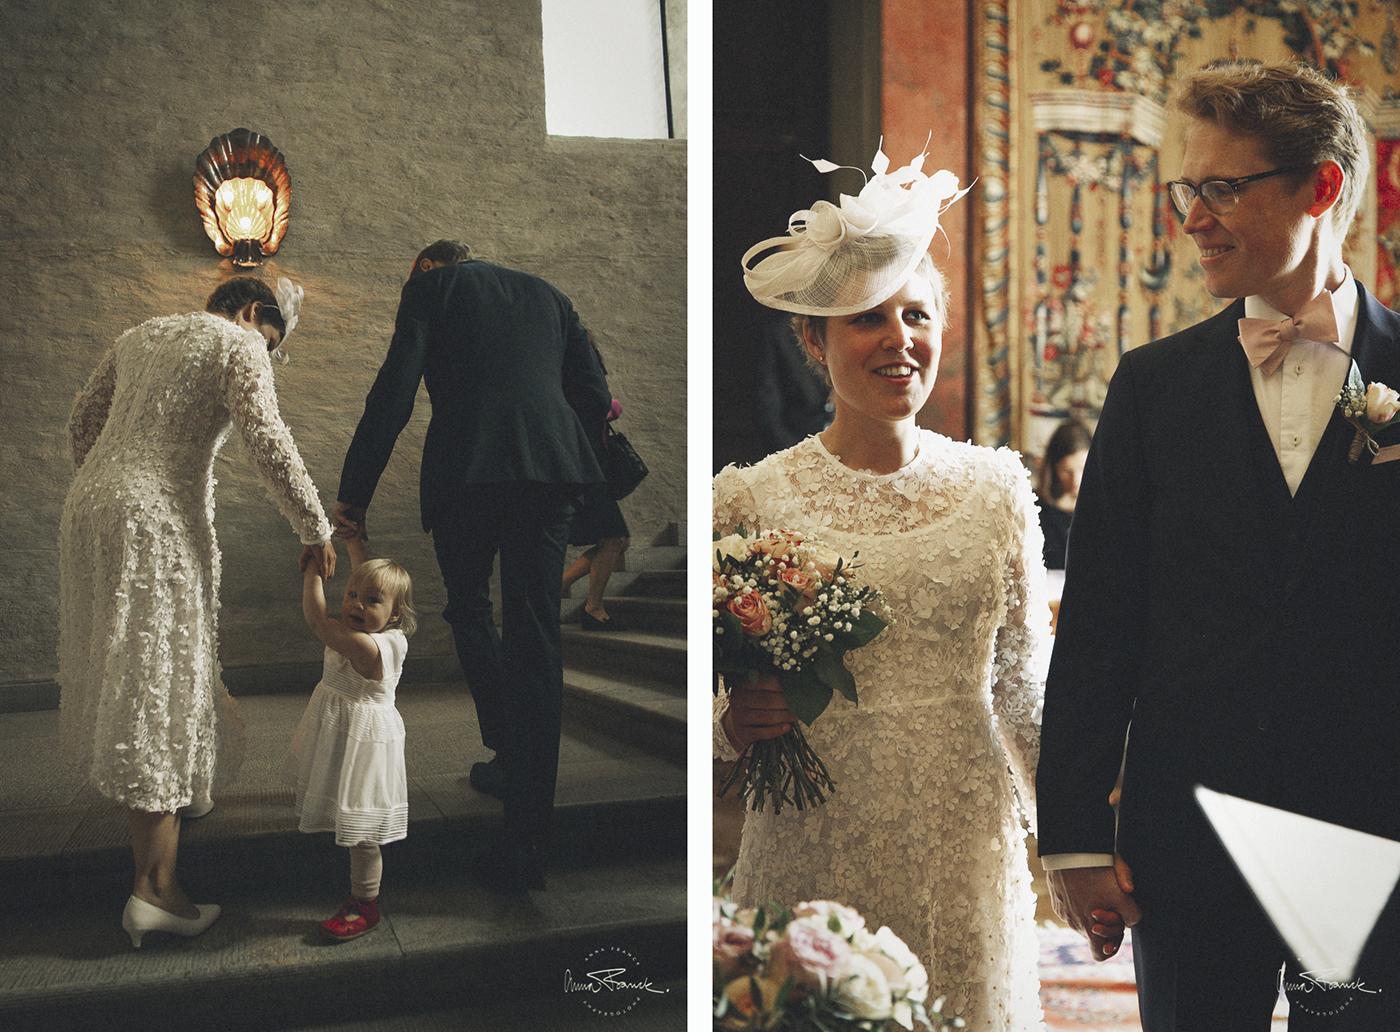 anna, franck, photography, fotograf, stockholm, bröllopsfotograf, weddingphotographer, cityhall, stadshuset, häävalokuvaaja, turku, parainen, pargas, åbo, naturligt, avslappnat